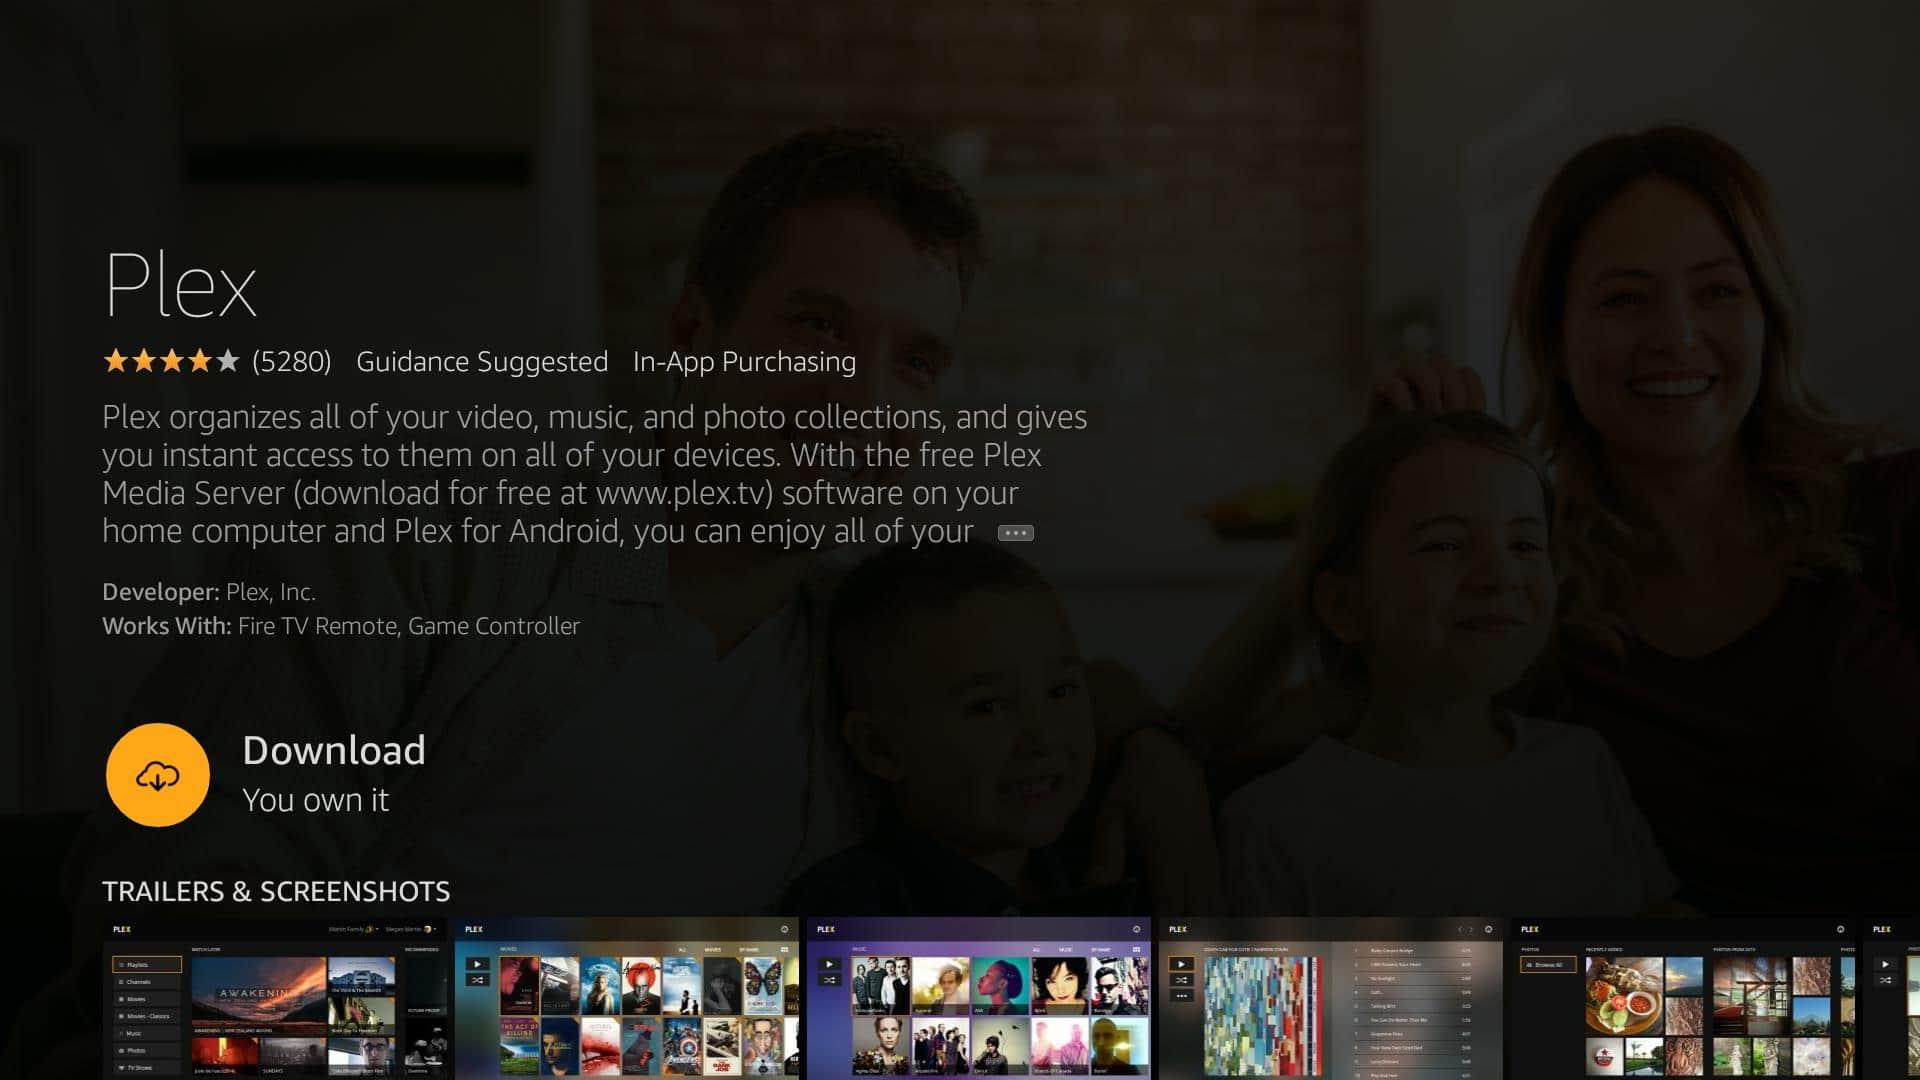 Installing and using the Fire TV Plex app | Comparitech